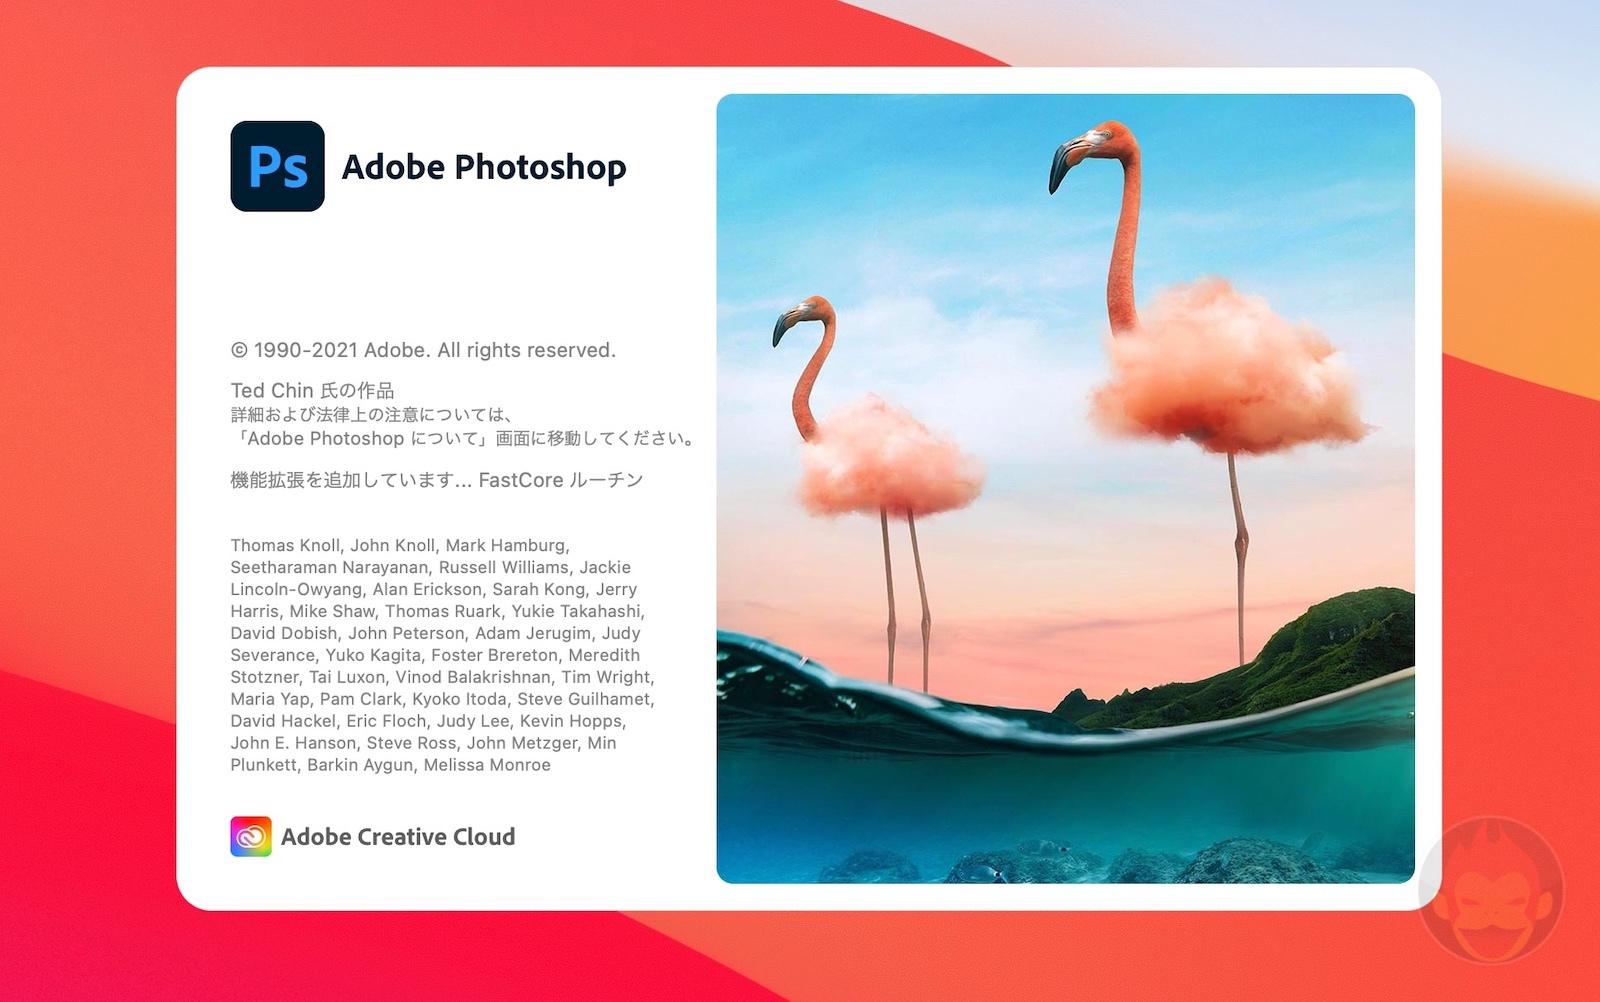 Adobe Photoshop How to run Native or Rosetta 04